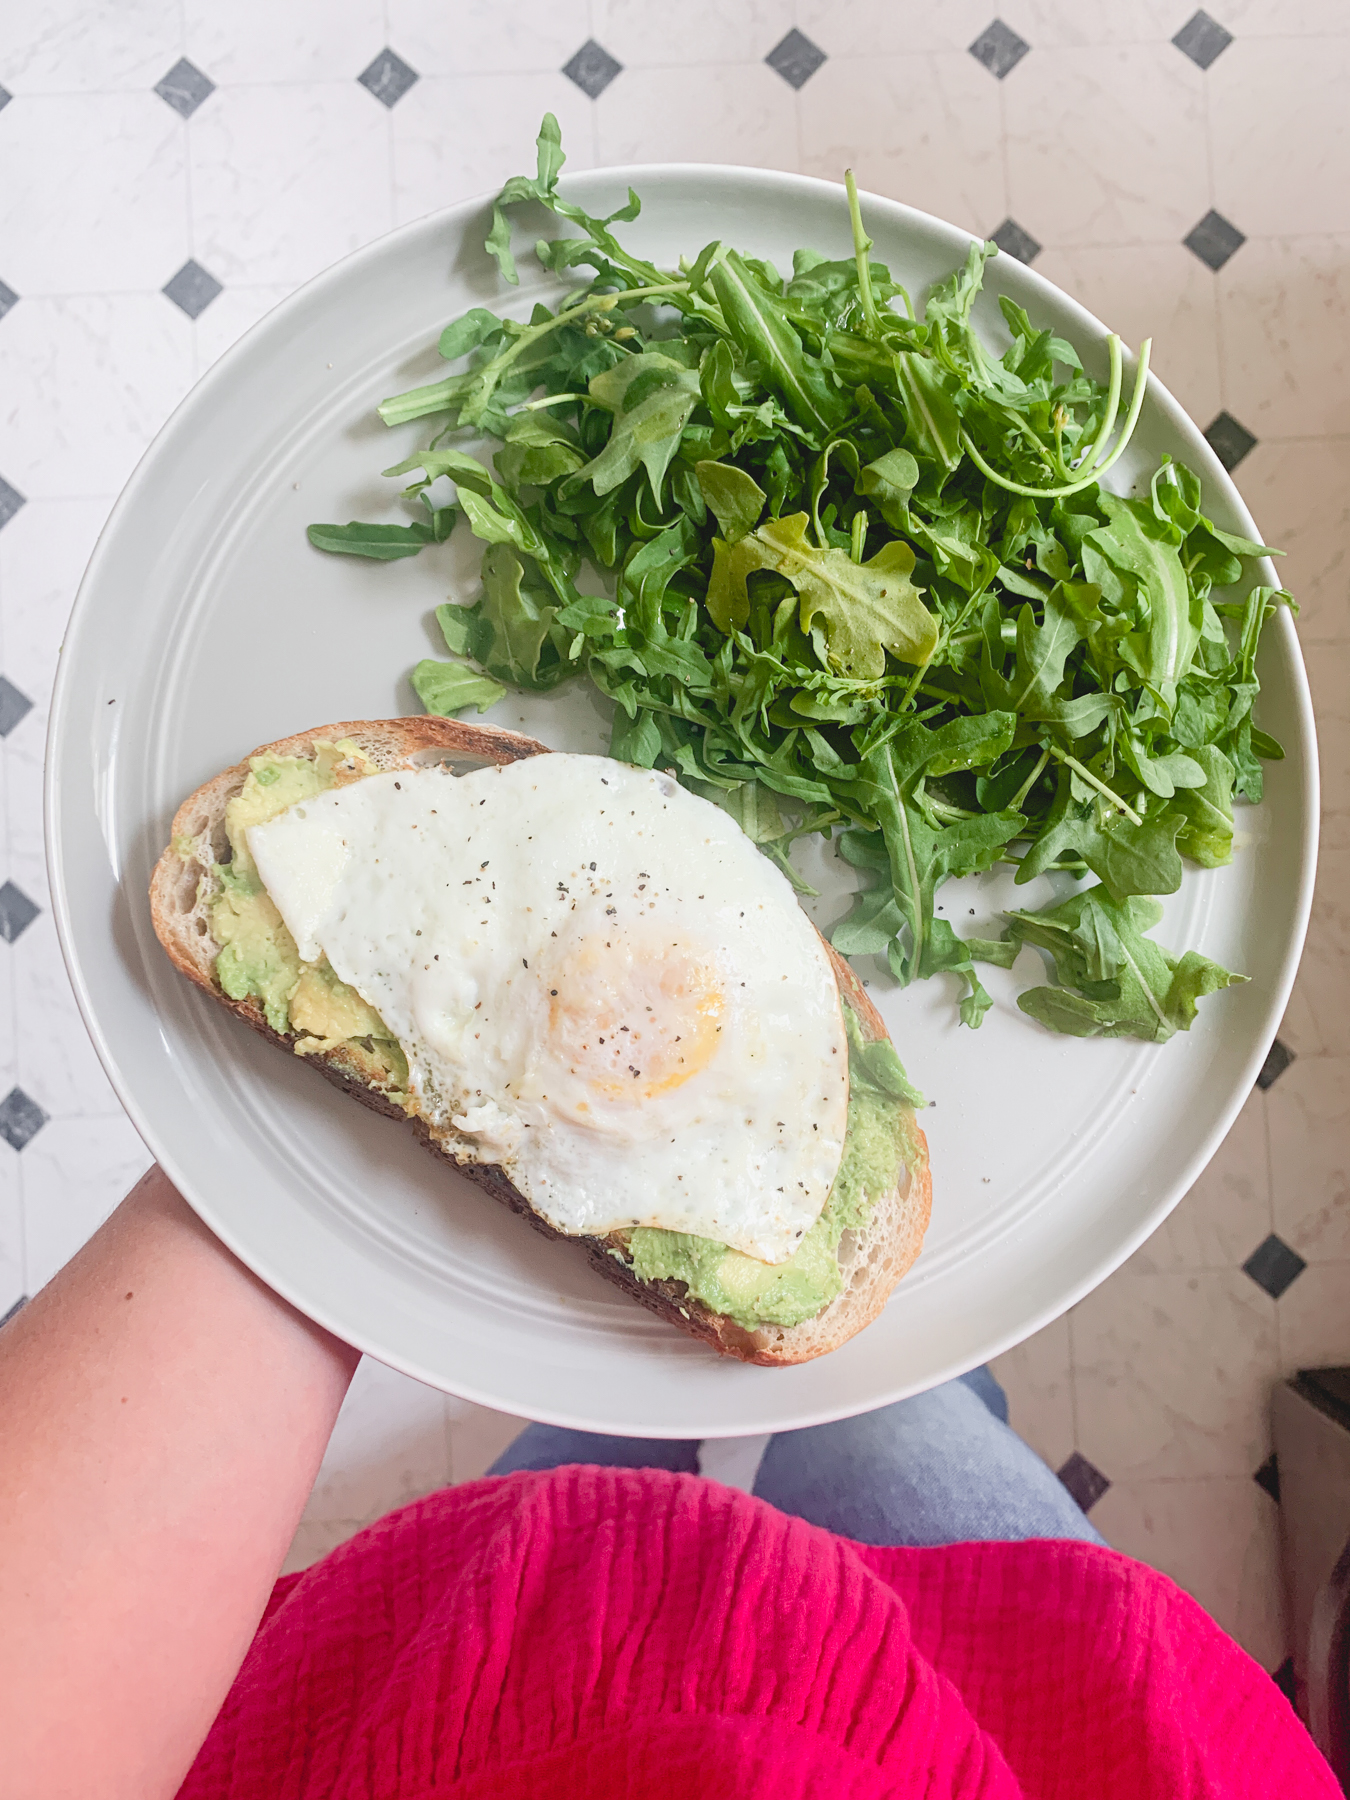 avocado toast with a fried egg and side salad